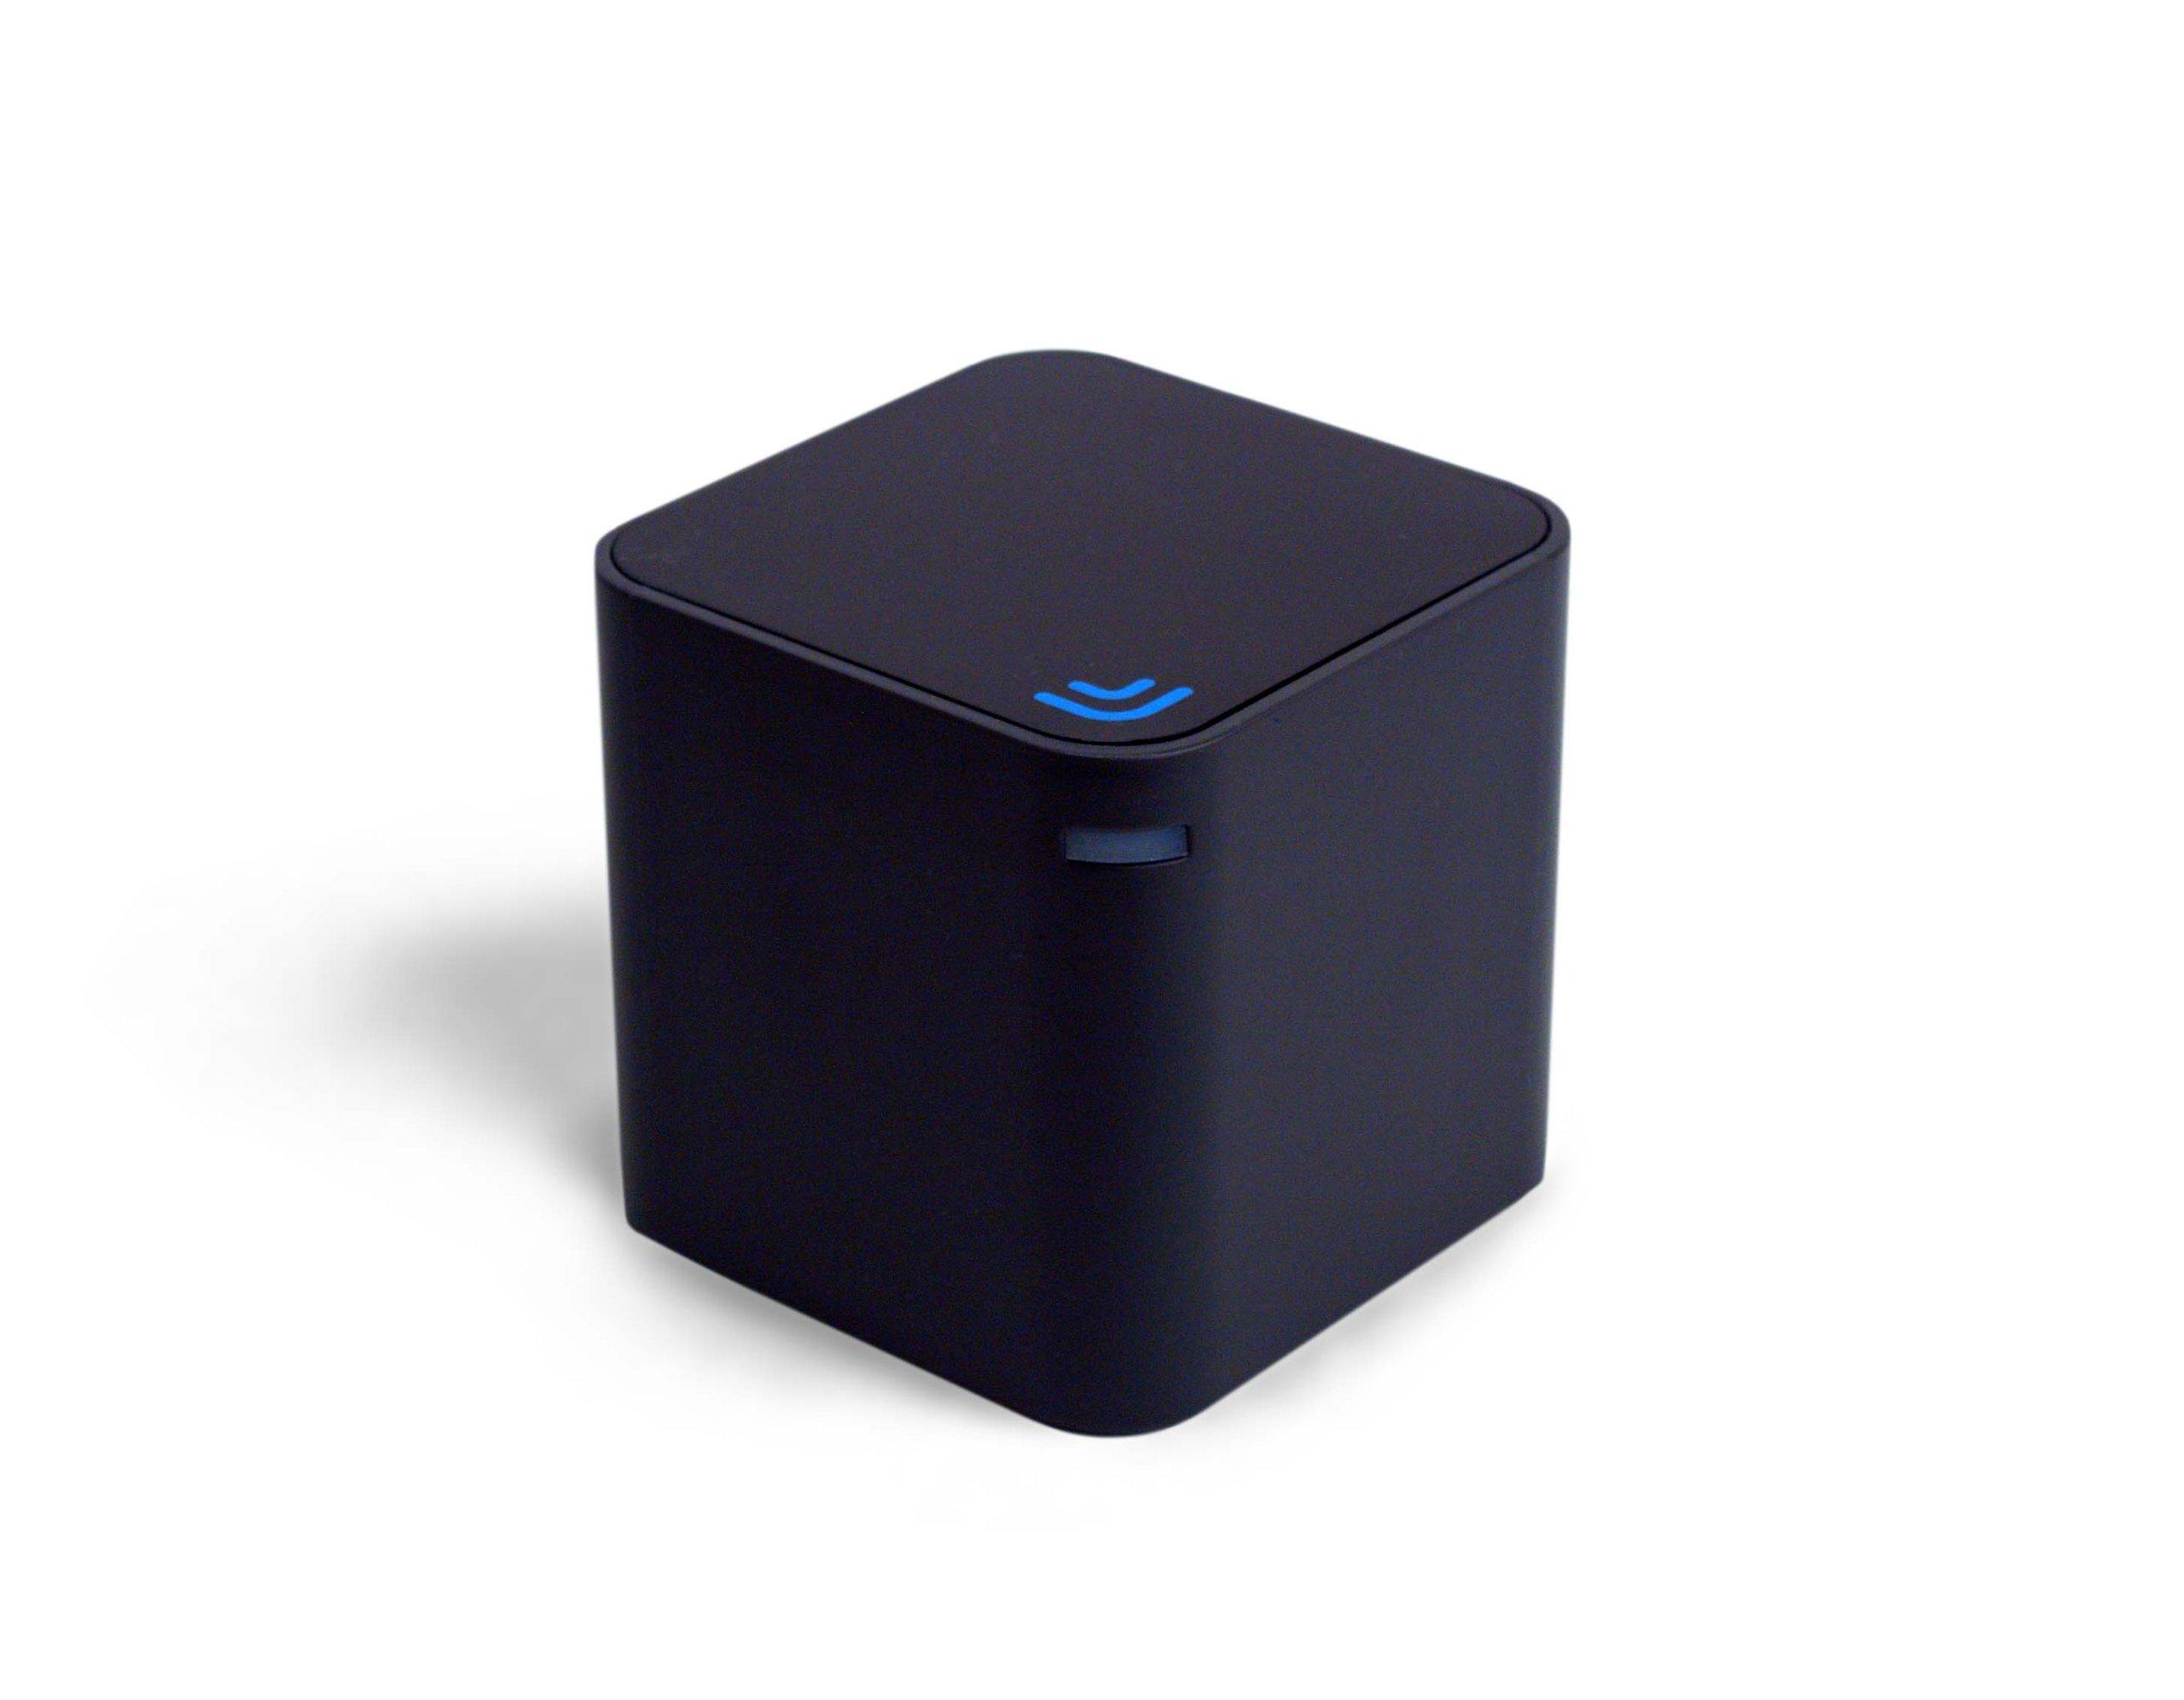 iRobot Braava Northstar Navigation Cube Accessories, Black